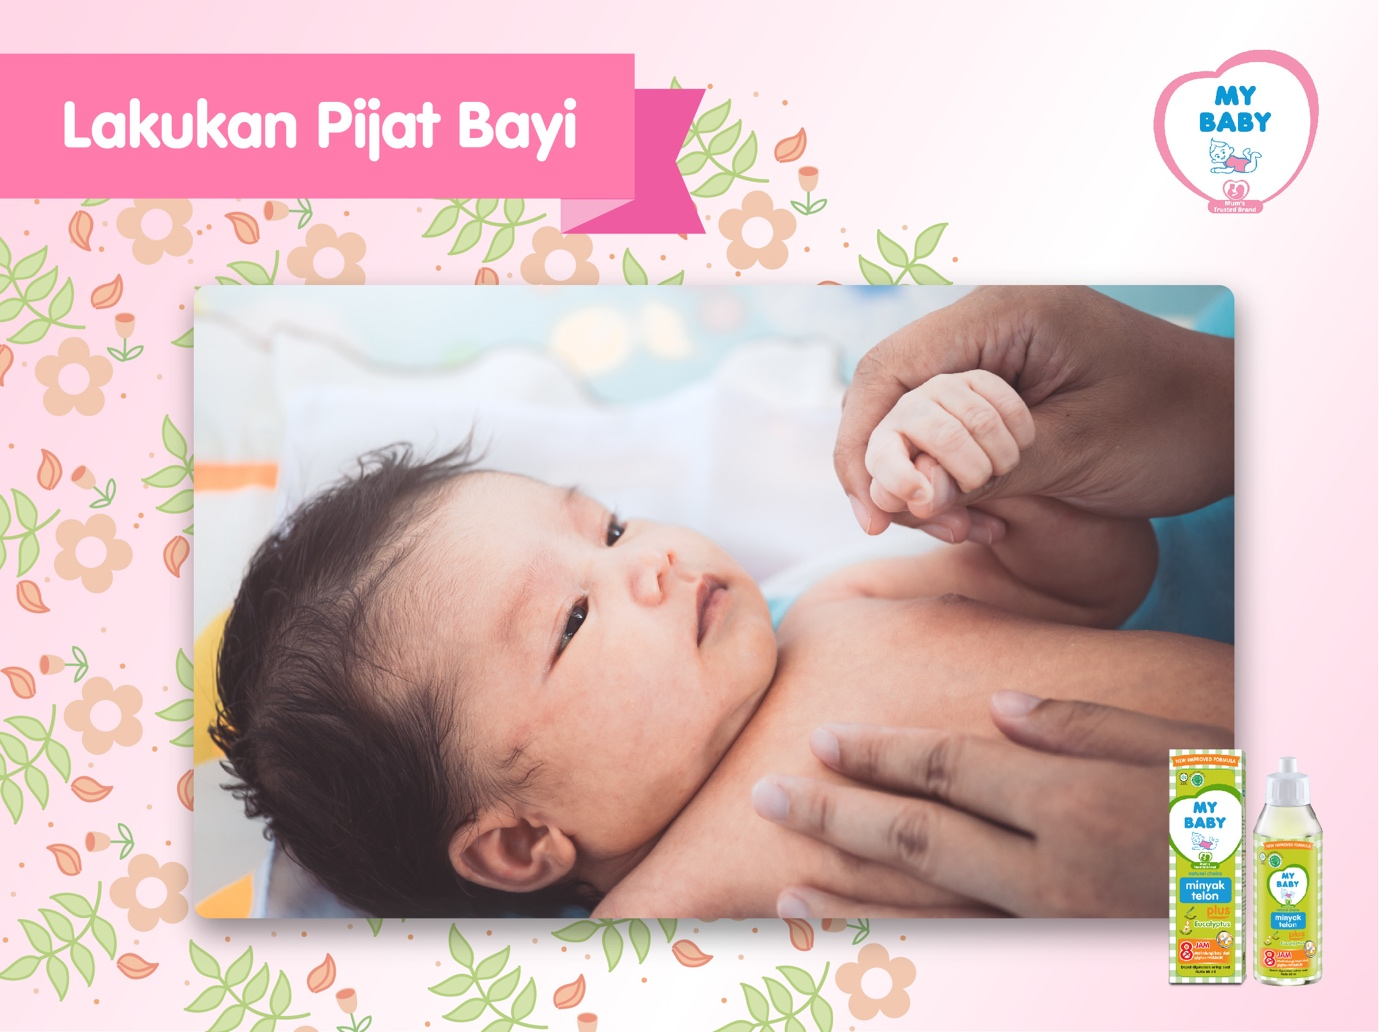 MyBaby - Bulan Pertama Perawatan Bayi Baru Lahir